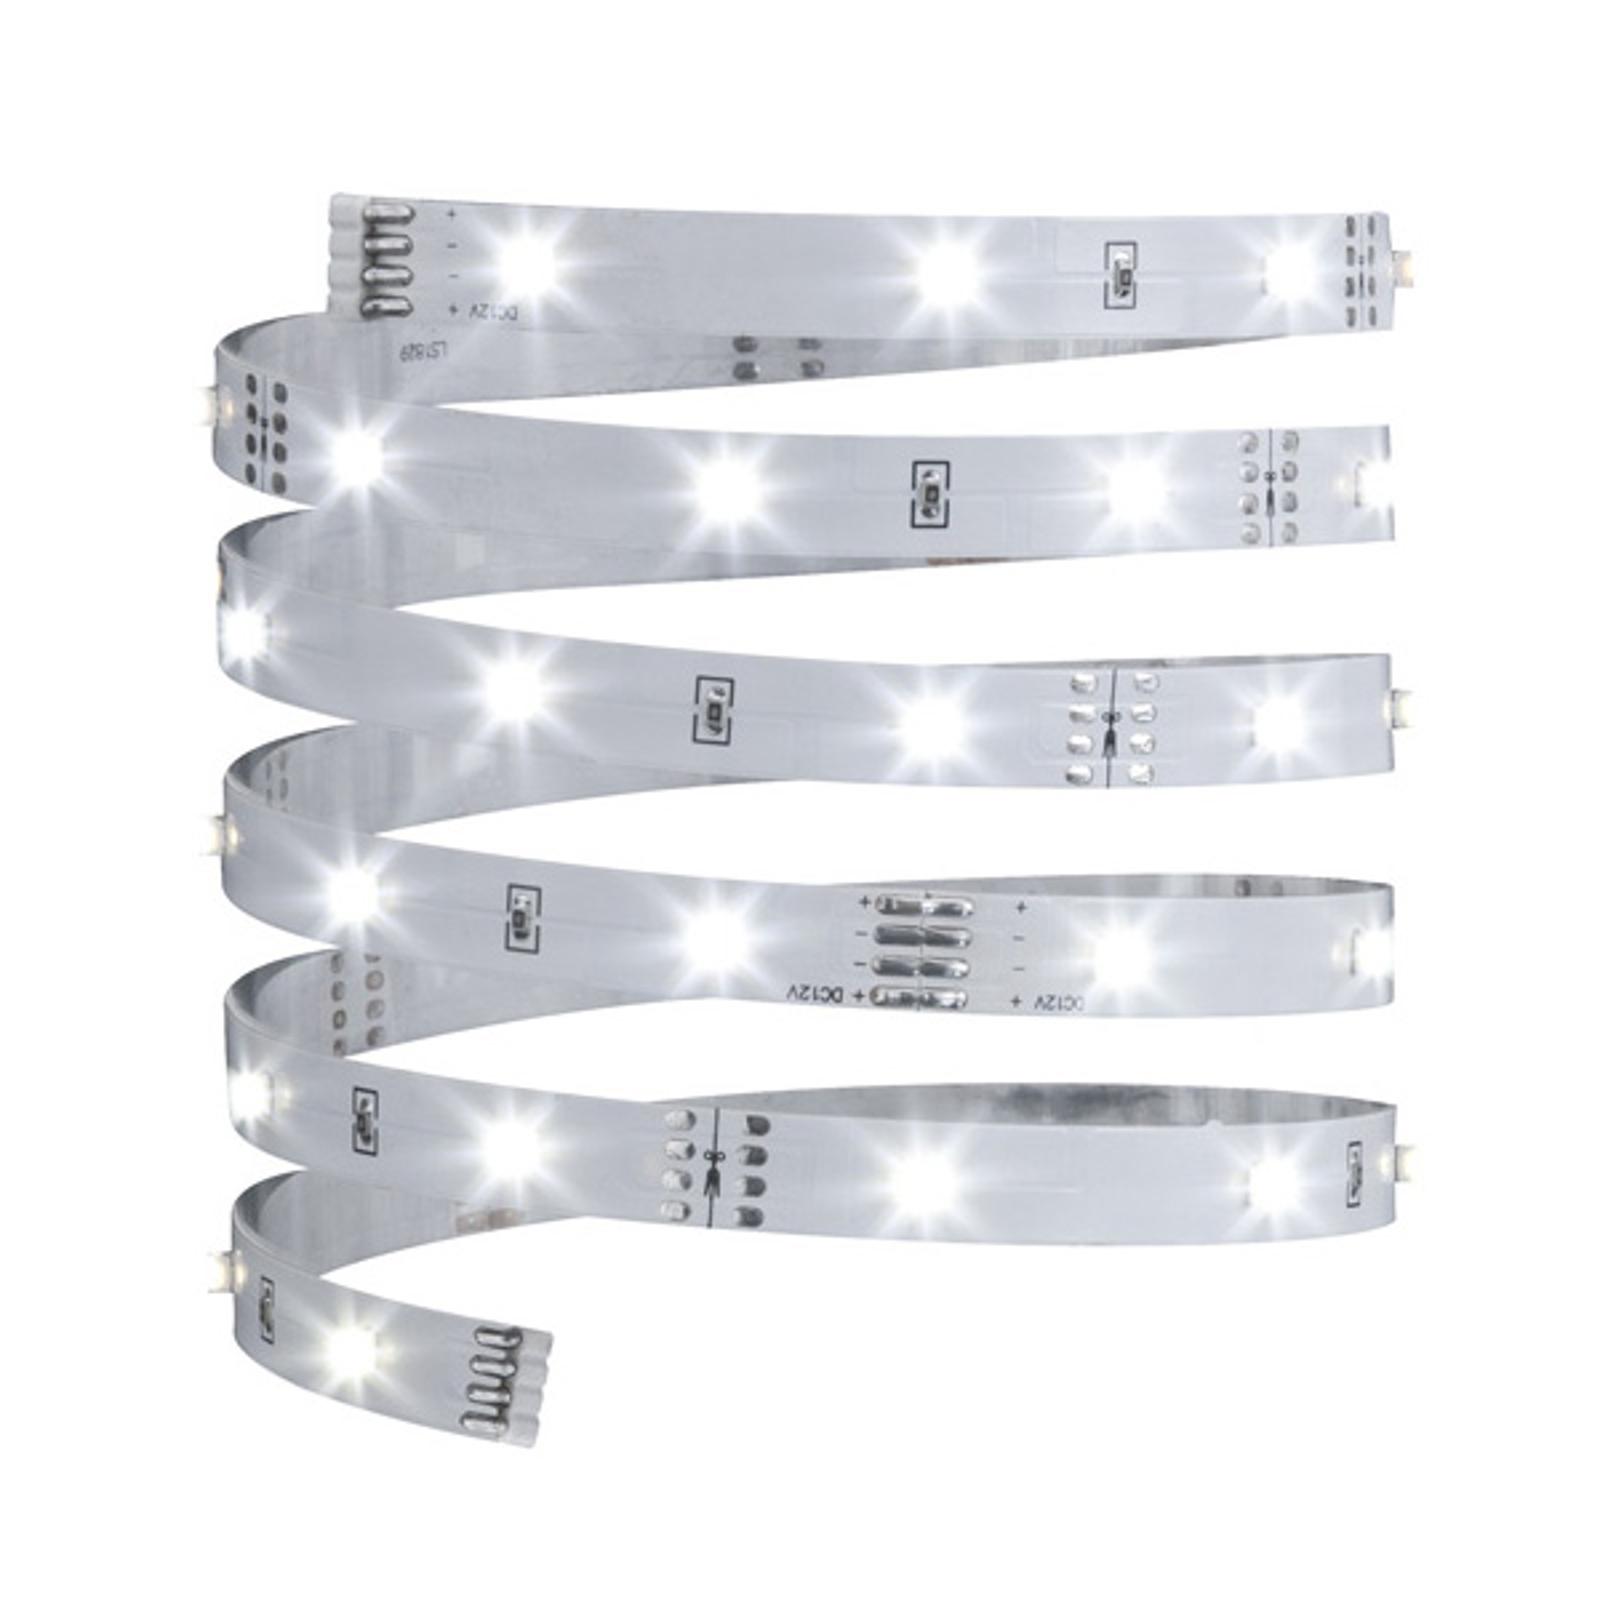 Paulmann YourLED Eco LED-Strip, 3m universalweiß